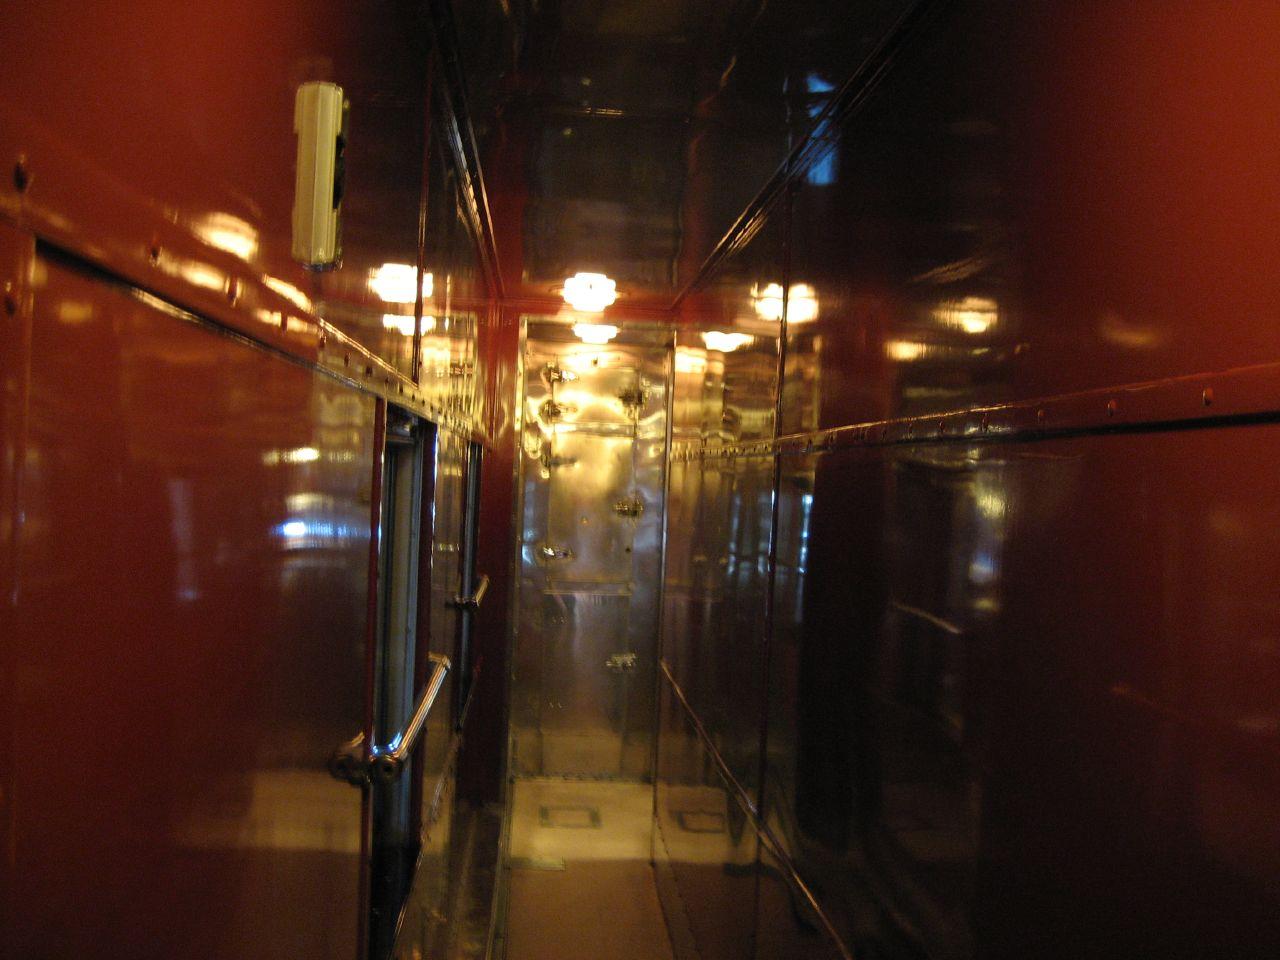 Dining Car, passageway